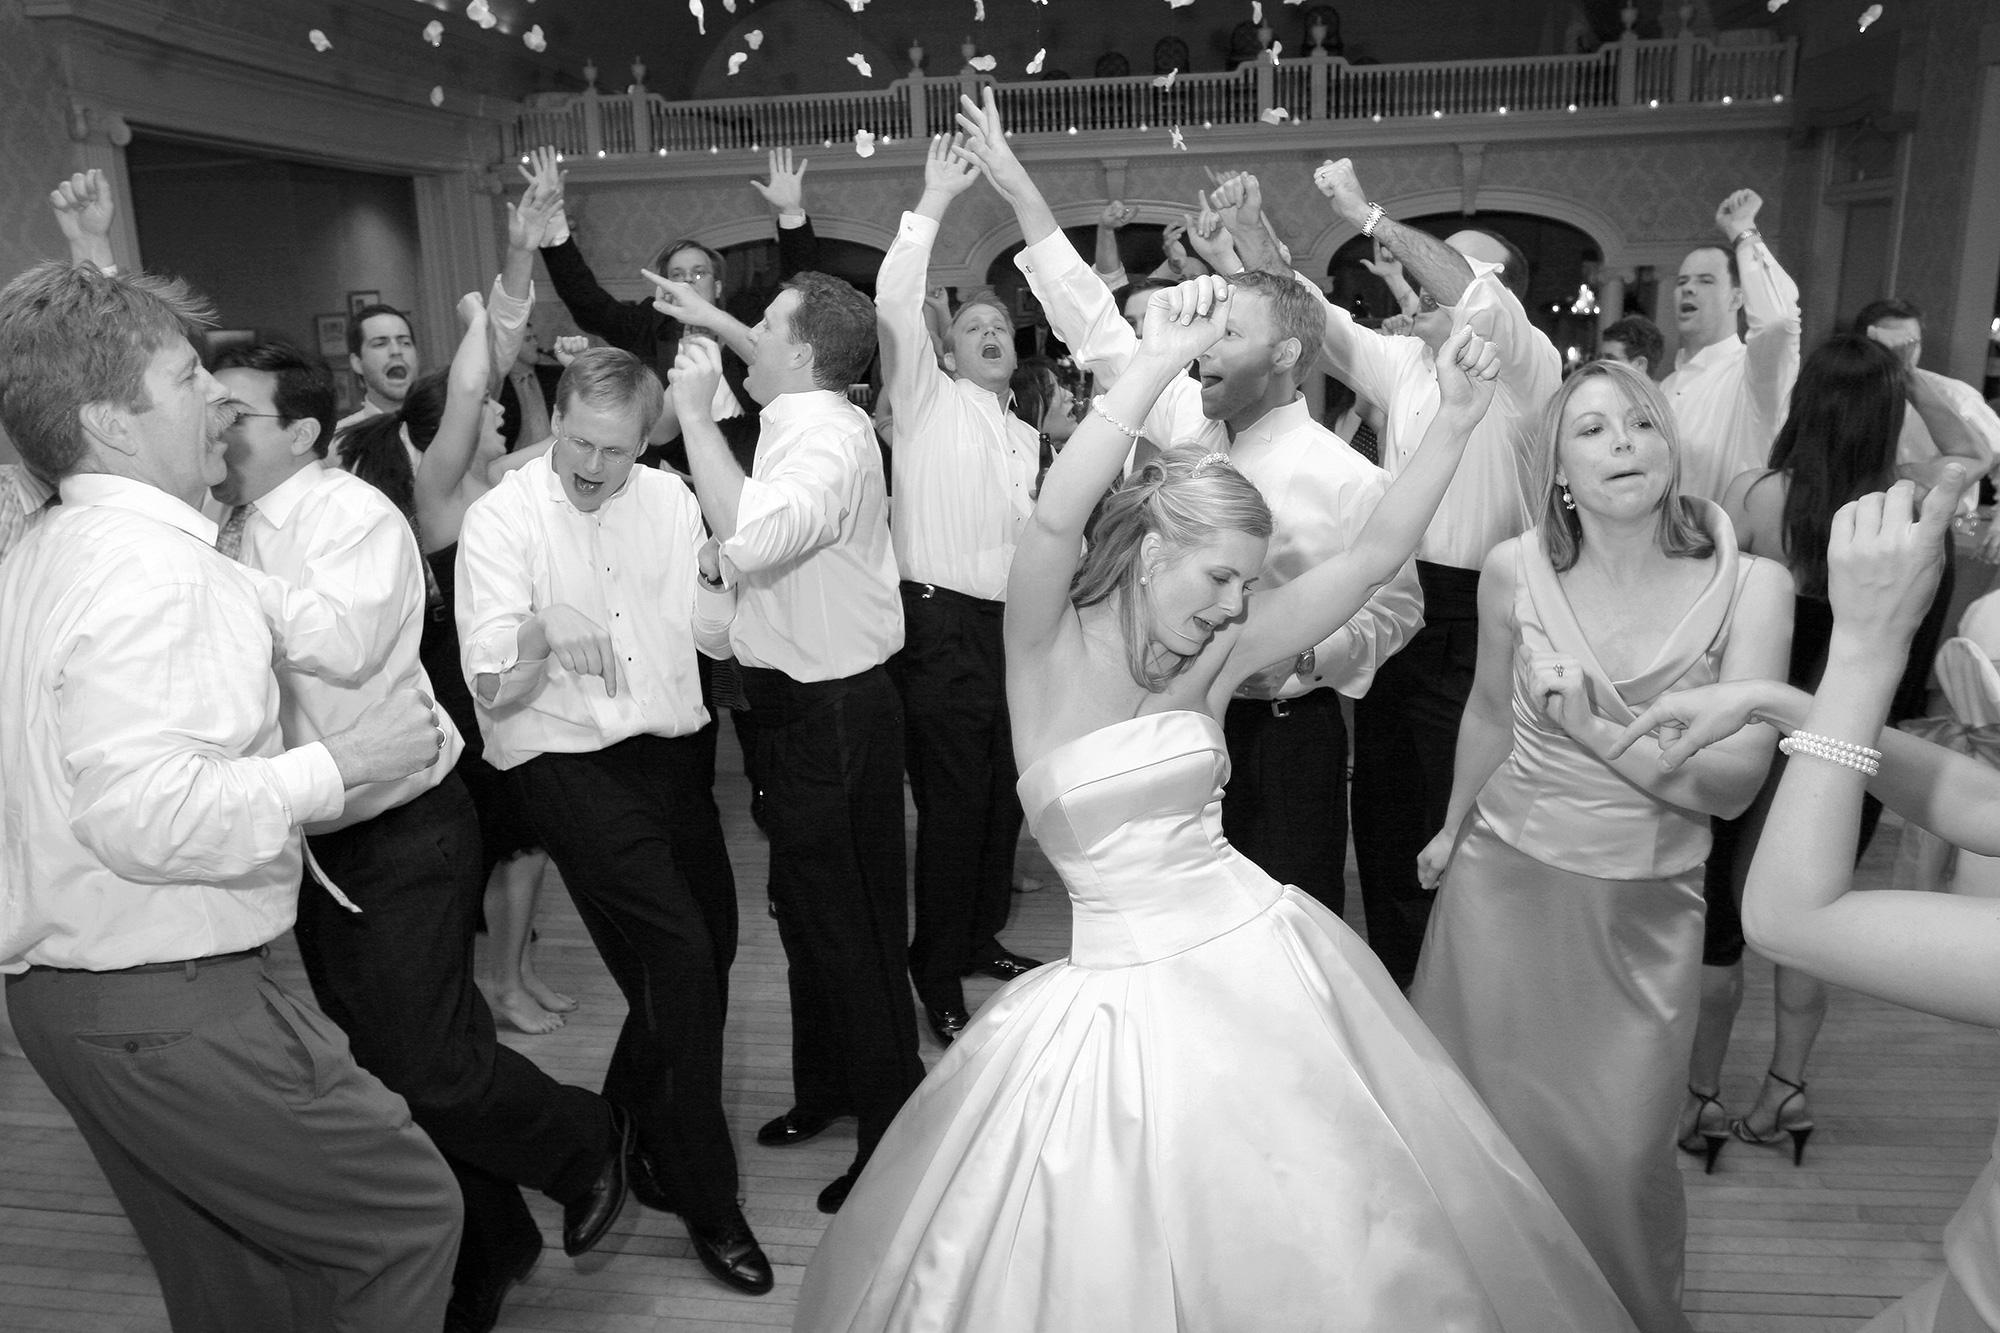 wedding-photography-saint-paul-mark-kegans-602.jpg